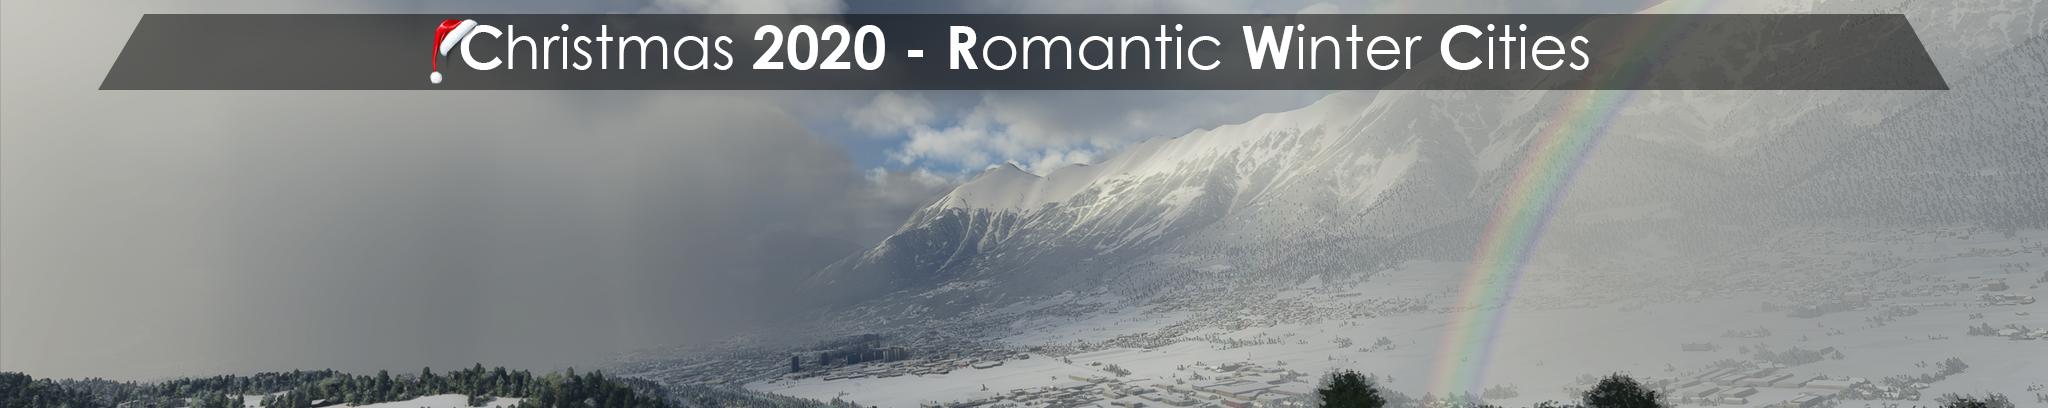 Christmas 2020 - Romantic Winter Cities